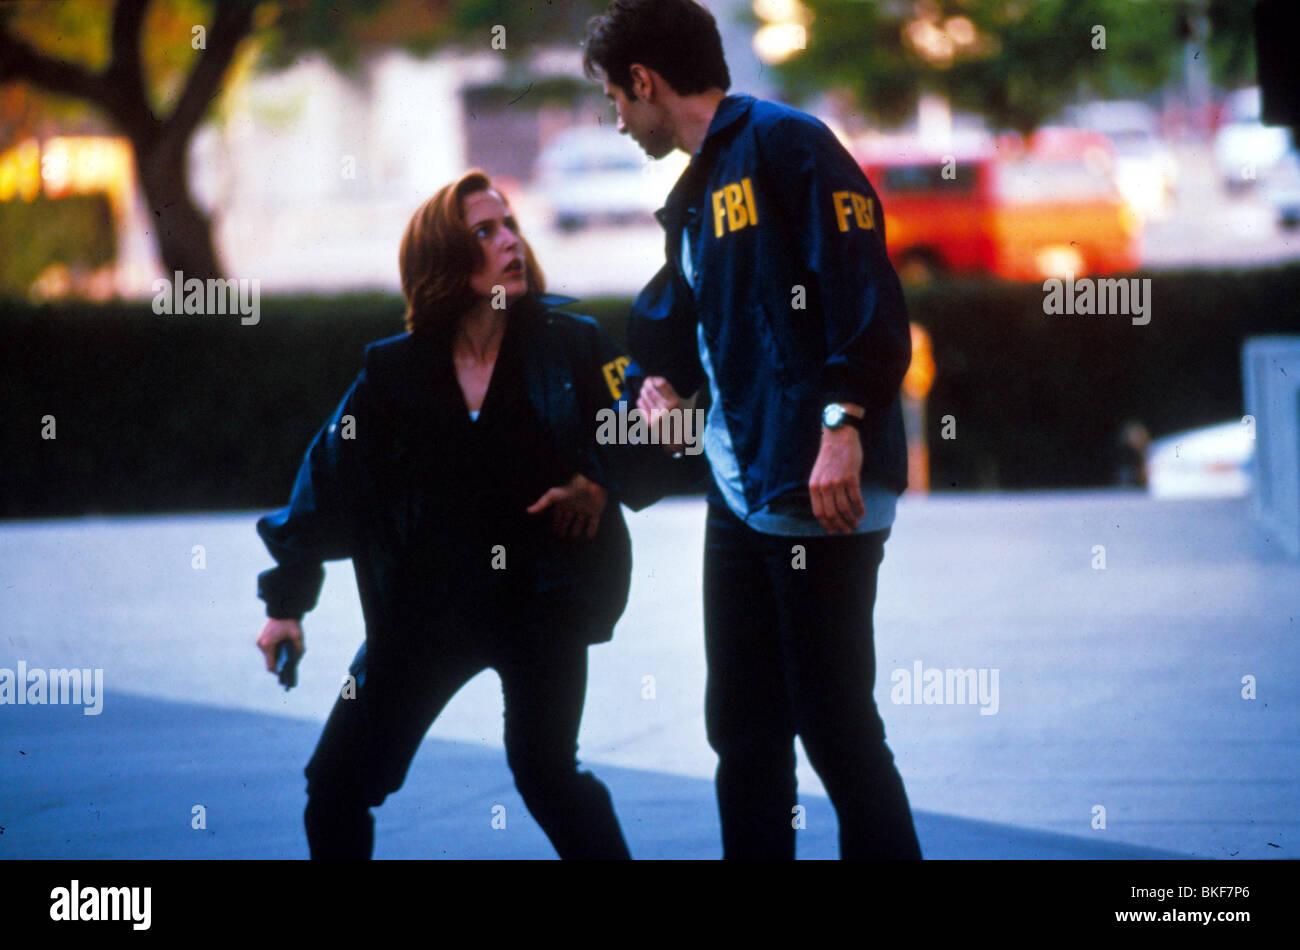 X-FILES: THE MOVIE (1998) GILLIAN ANDERSON, DAVID DUCHOVNY XFM 038 - Stock Image